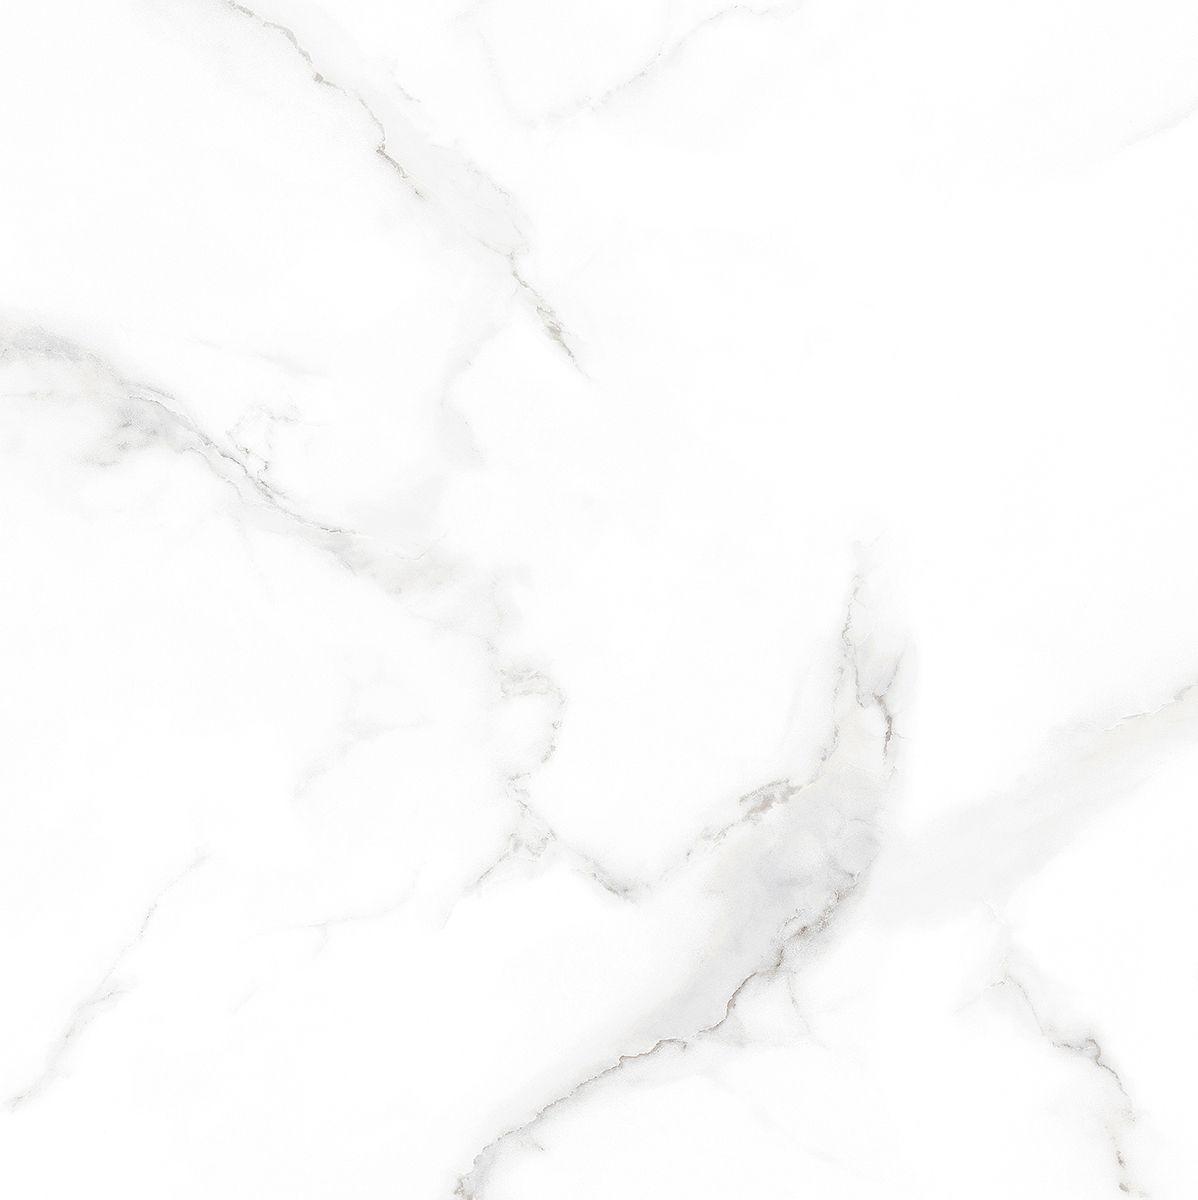 MA8855P型号瓷砖 经高温煅烧制成 天然纹理